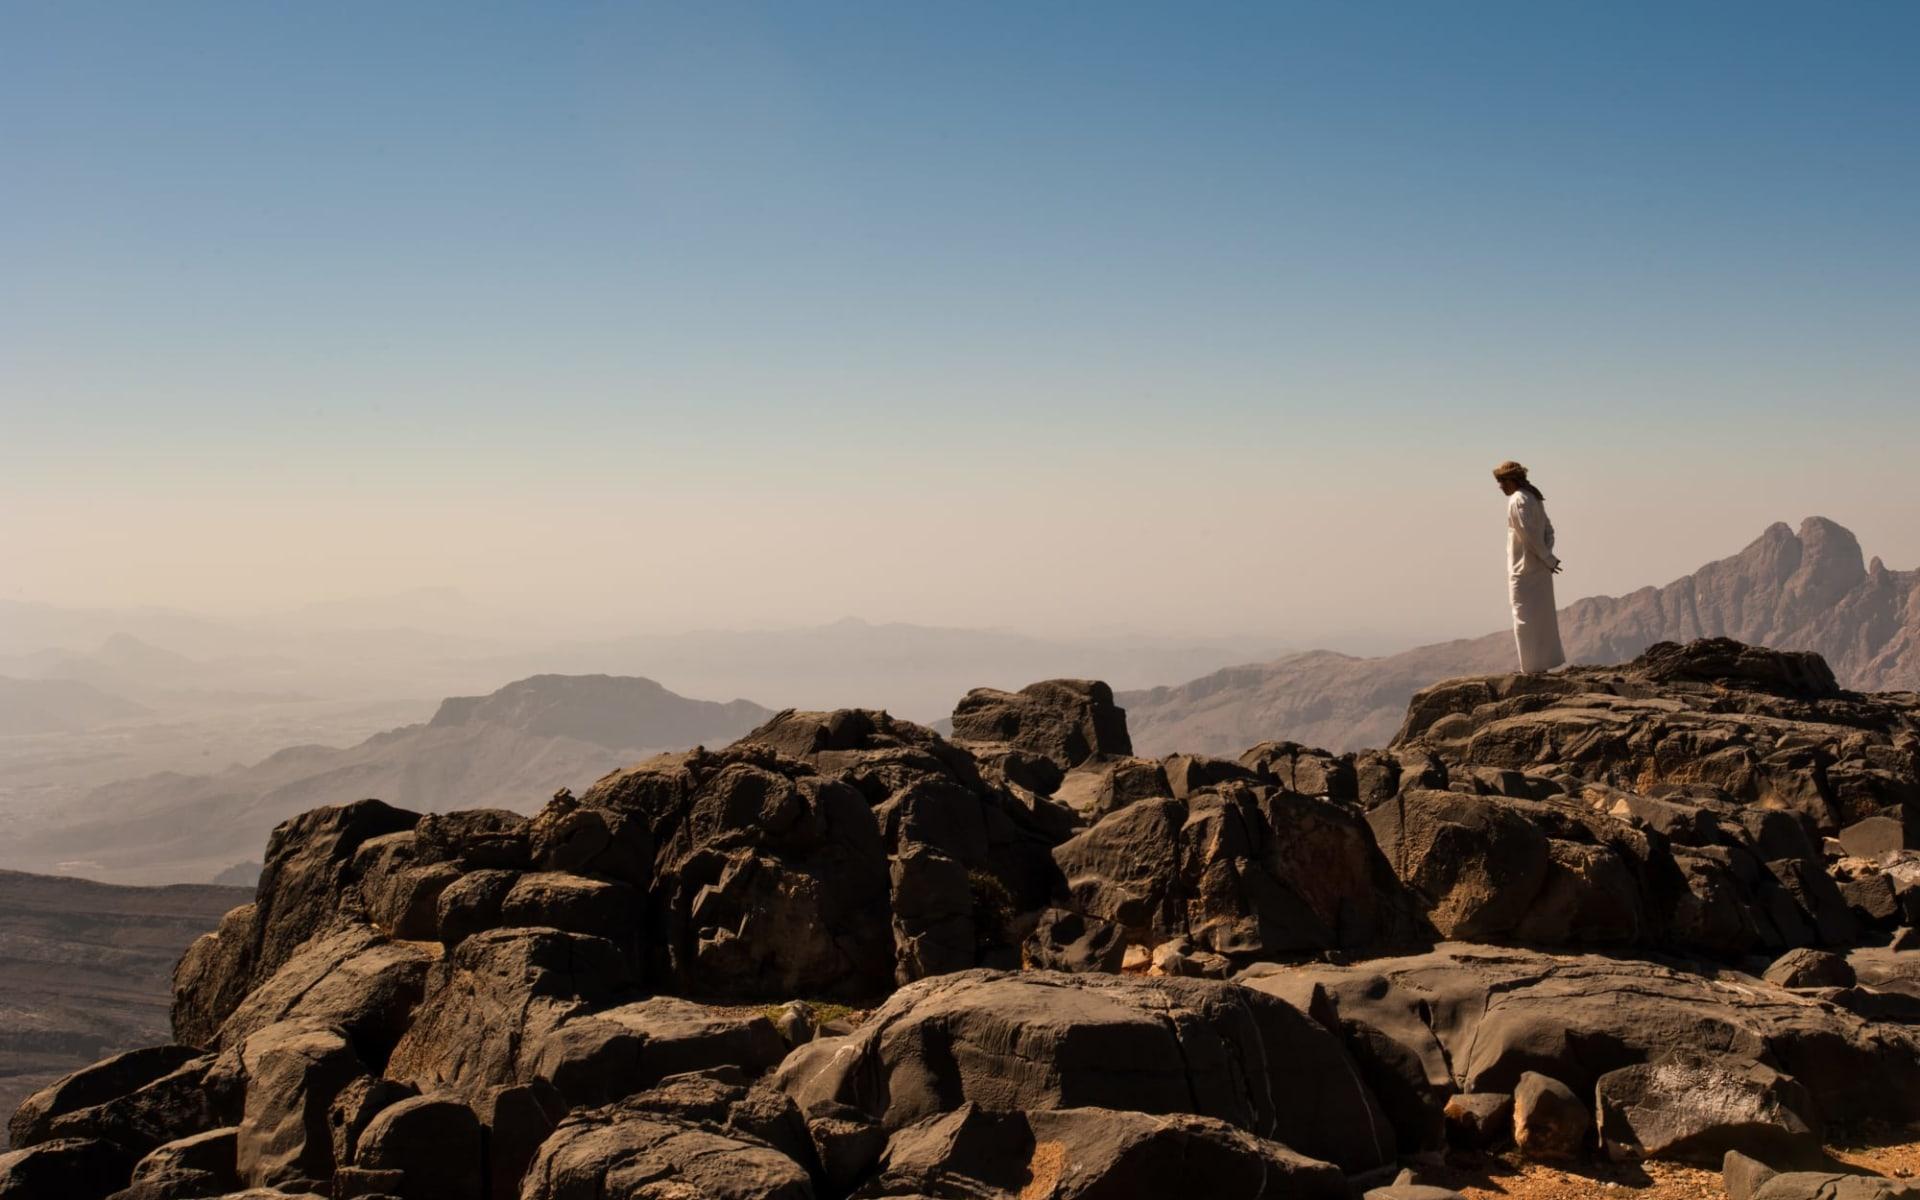 Exquisites Sultanat ab Muscat: Landscape scenery